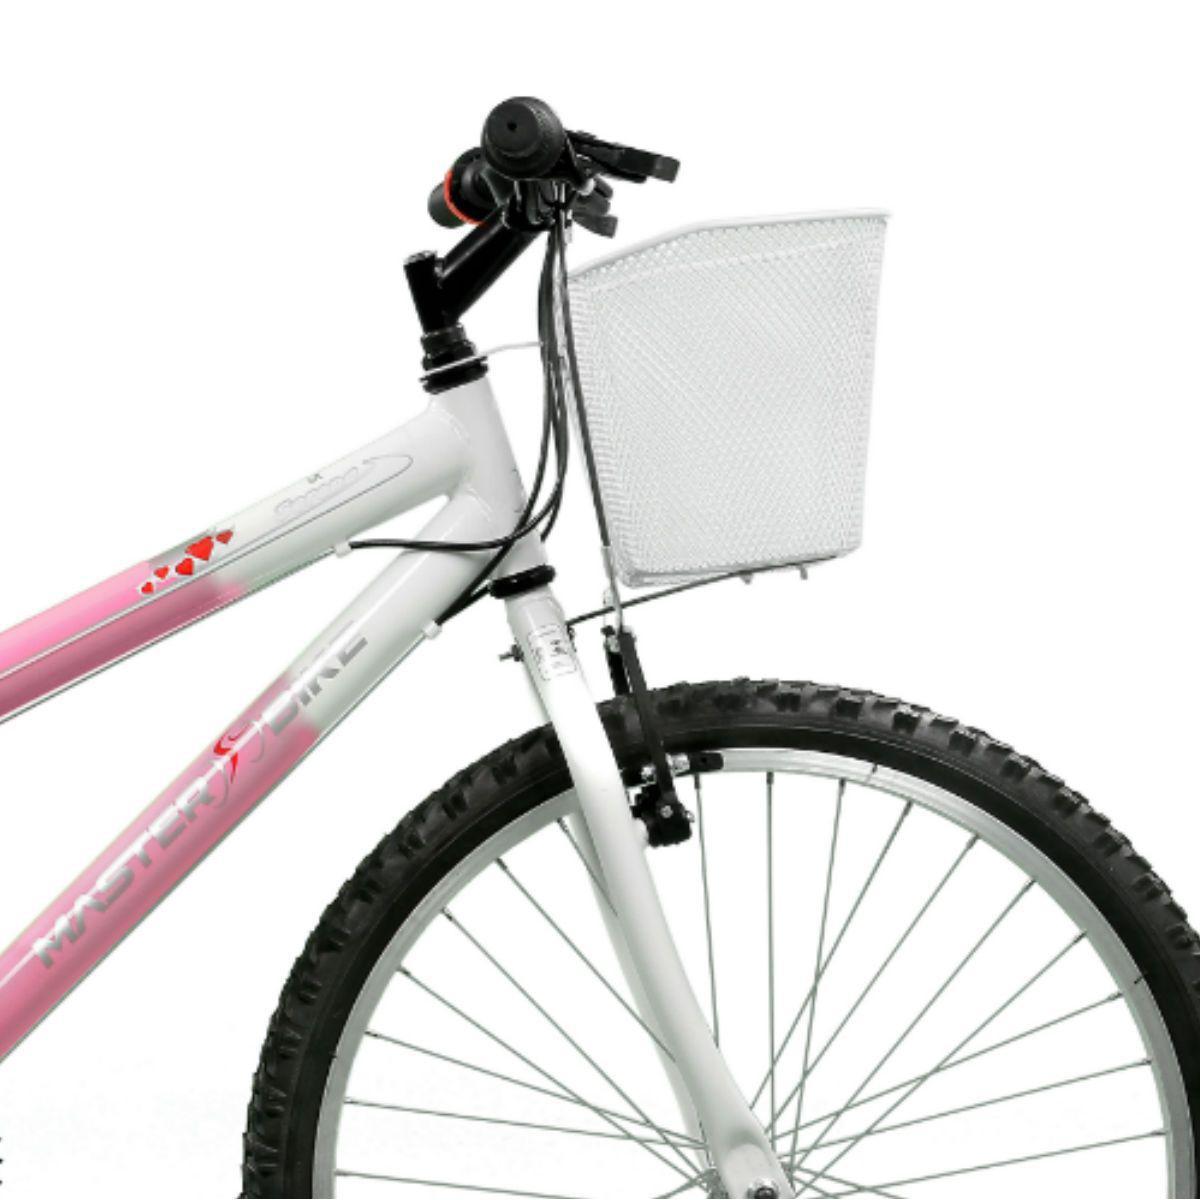 3e7a95417 Bicicleta Master Bike Aro 24 Serena Plus 21 Marchas V-Brake Rosa Branco R   523